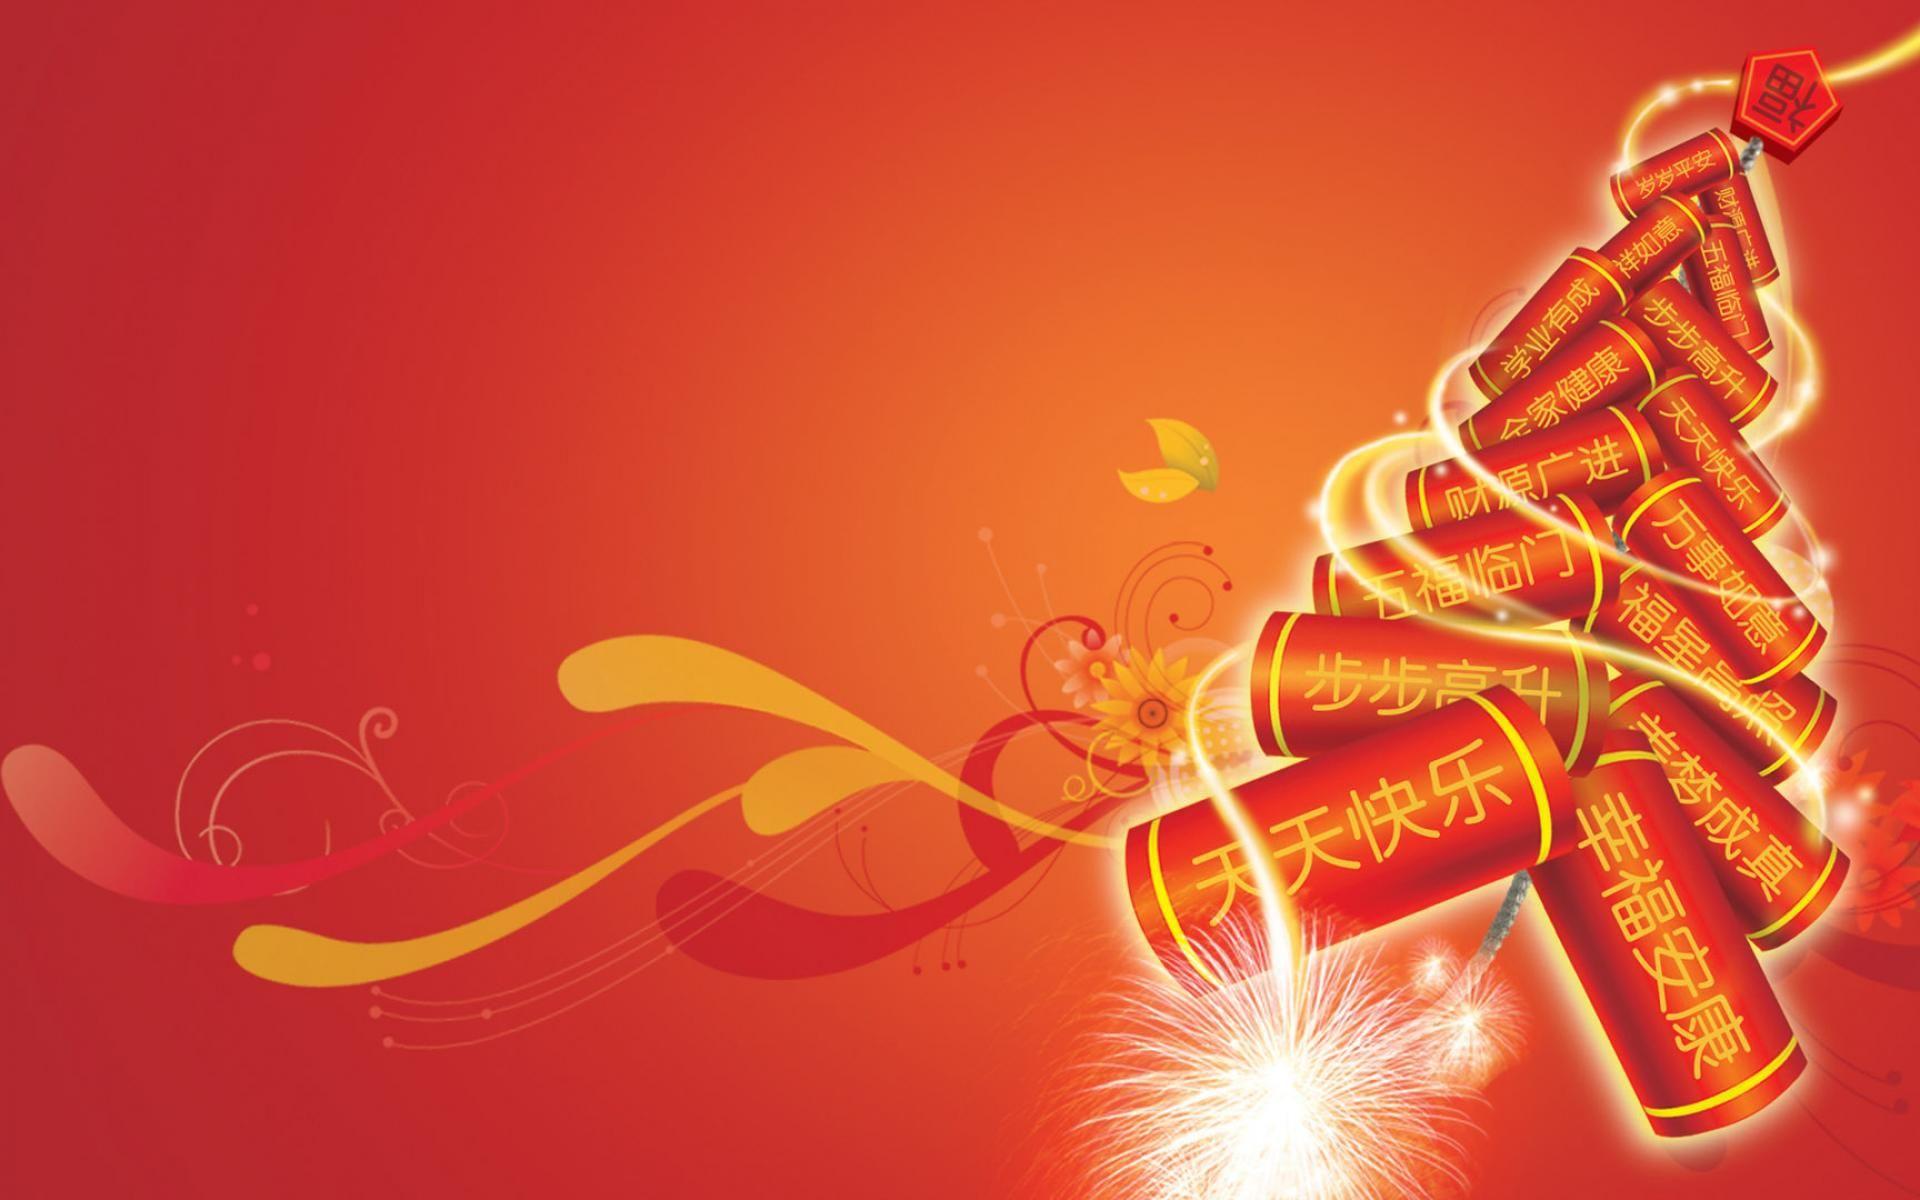 Chinese New Year Wallpaper HD 1920x1200